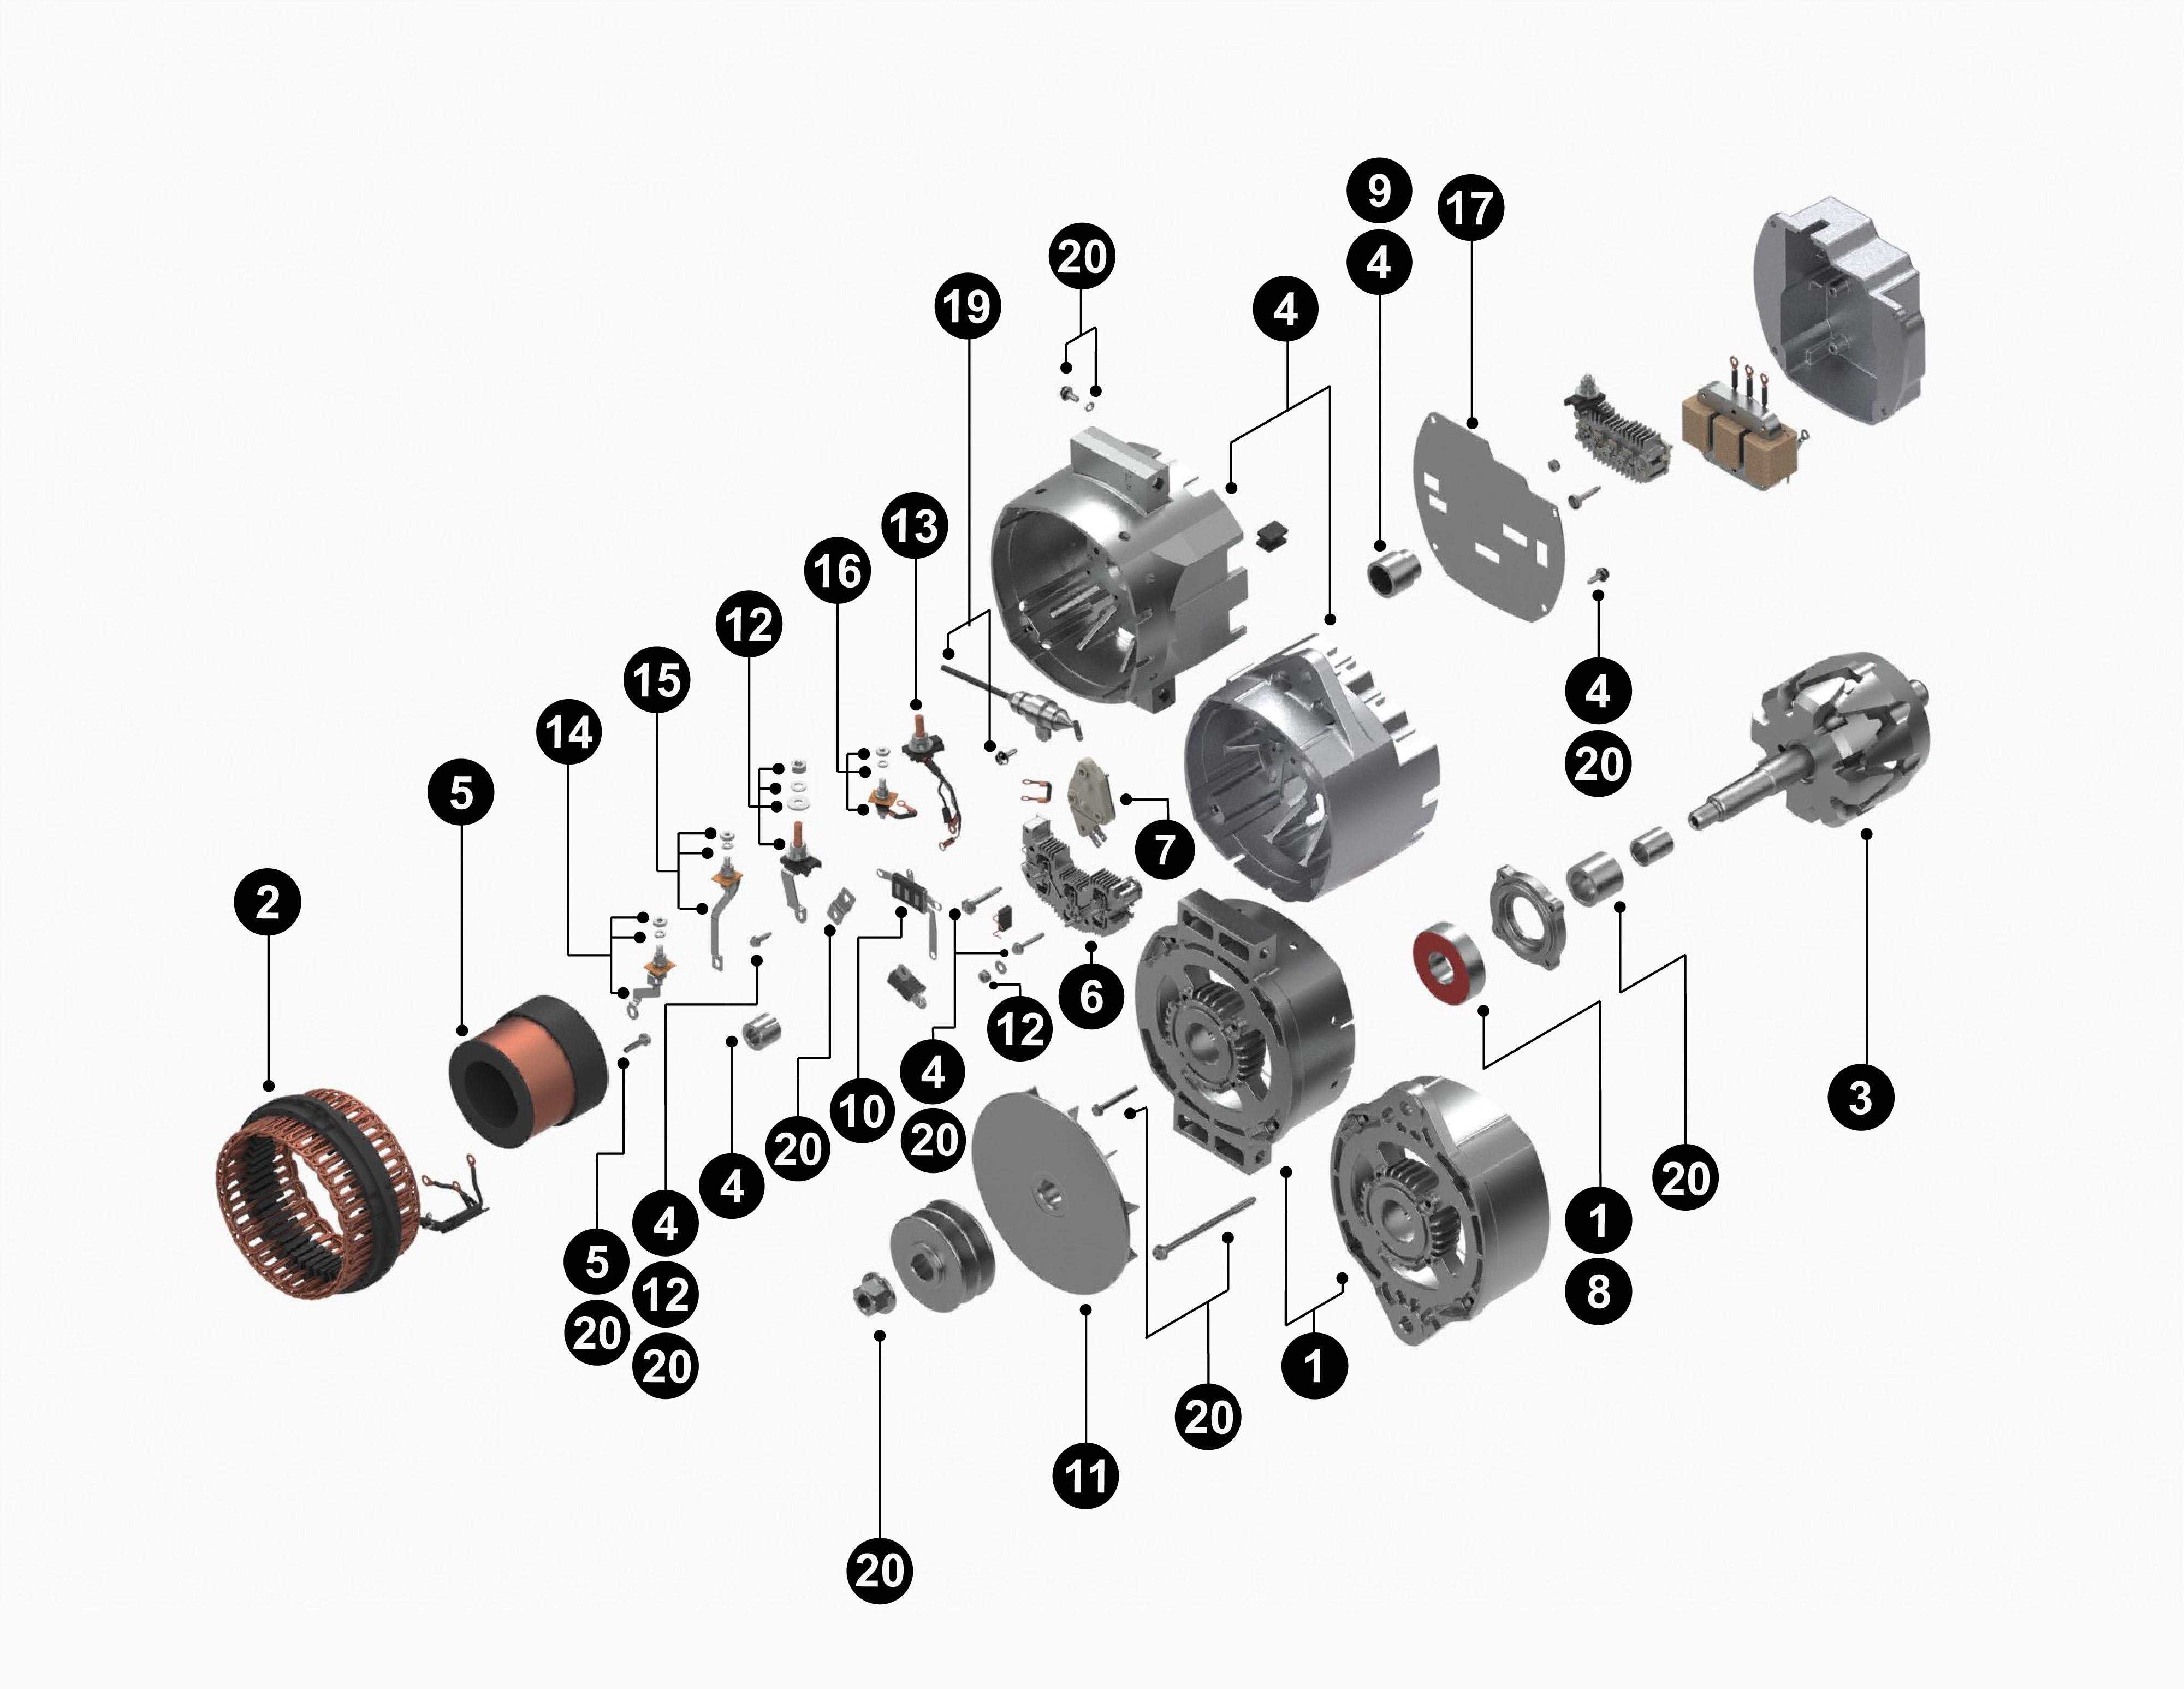 Alternator Wiring Diagram On Sony Marine Stereo Wiring Diagram